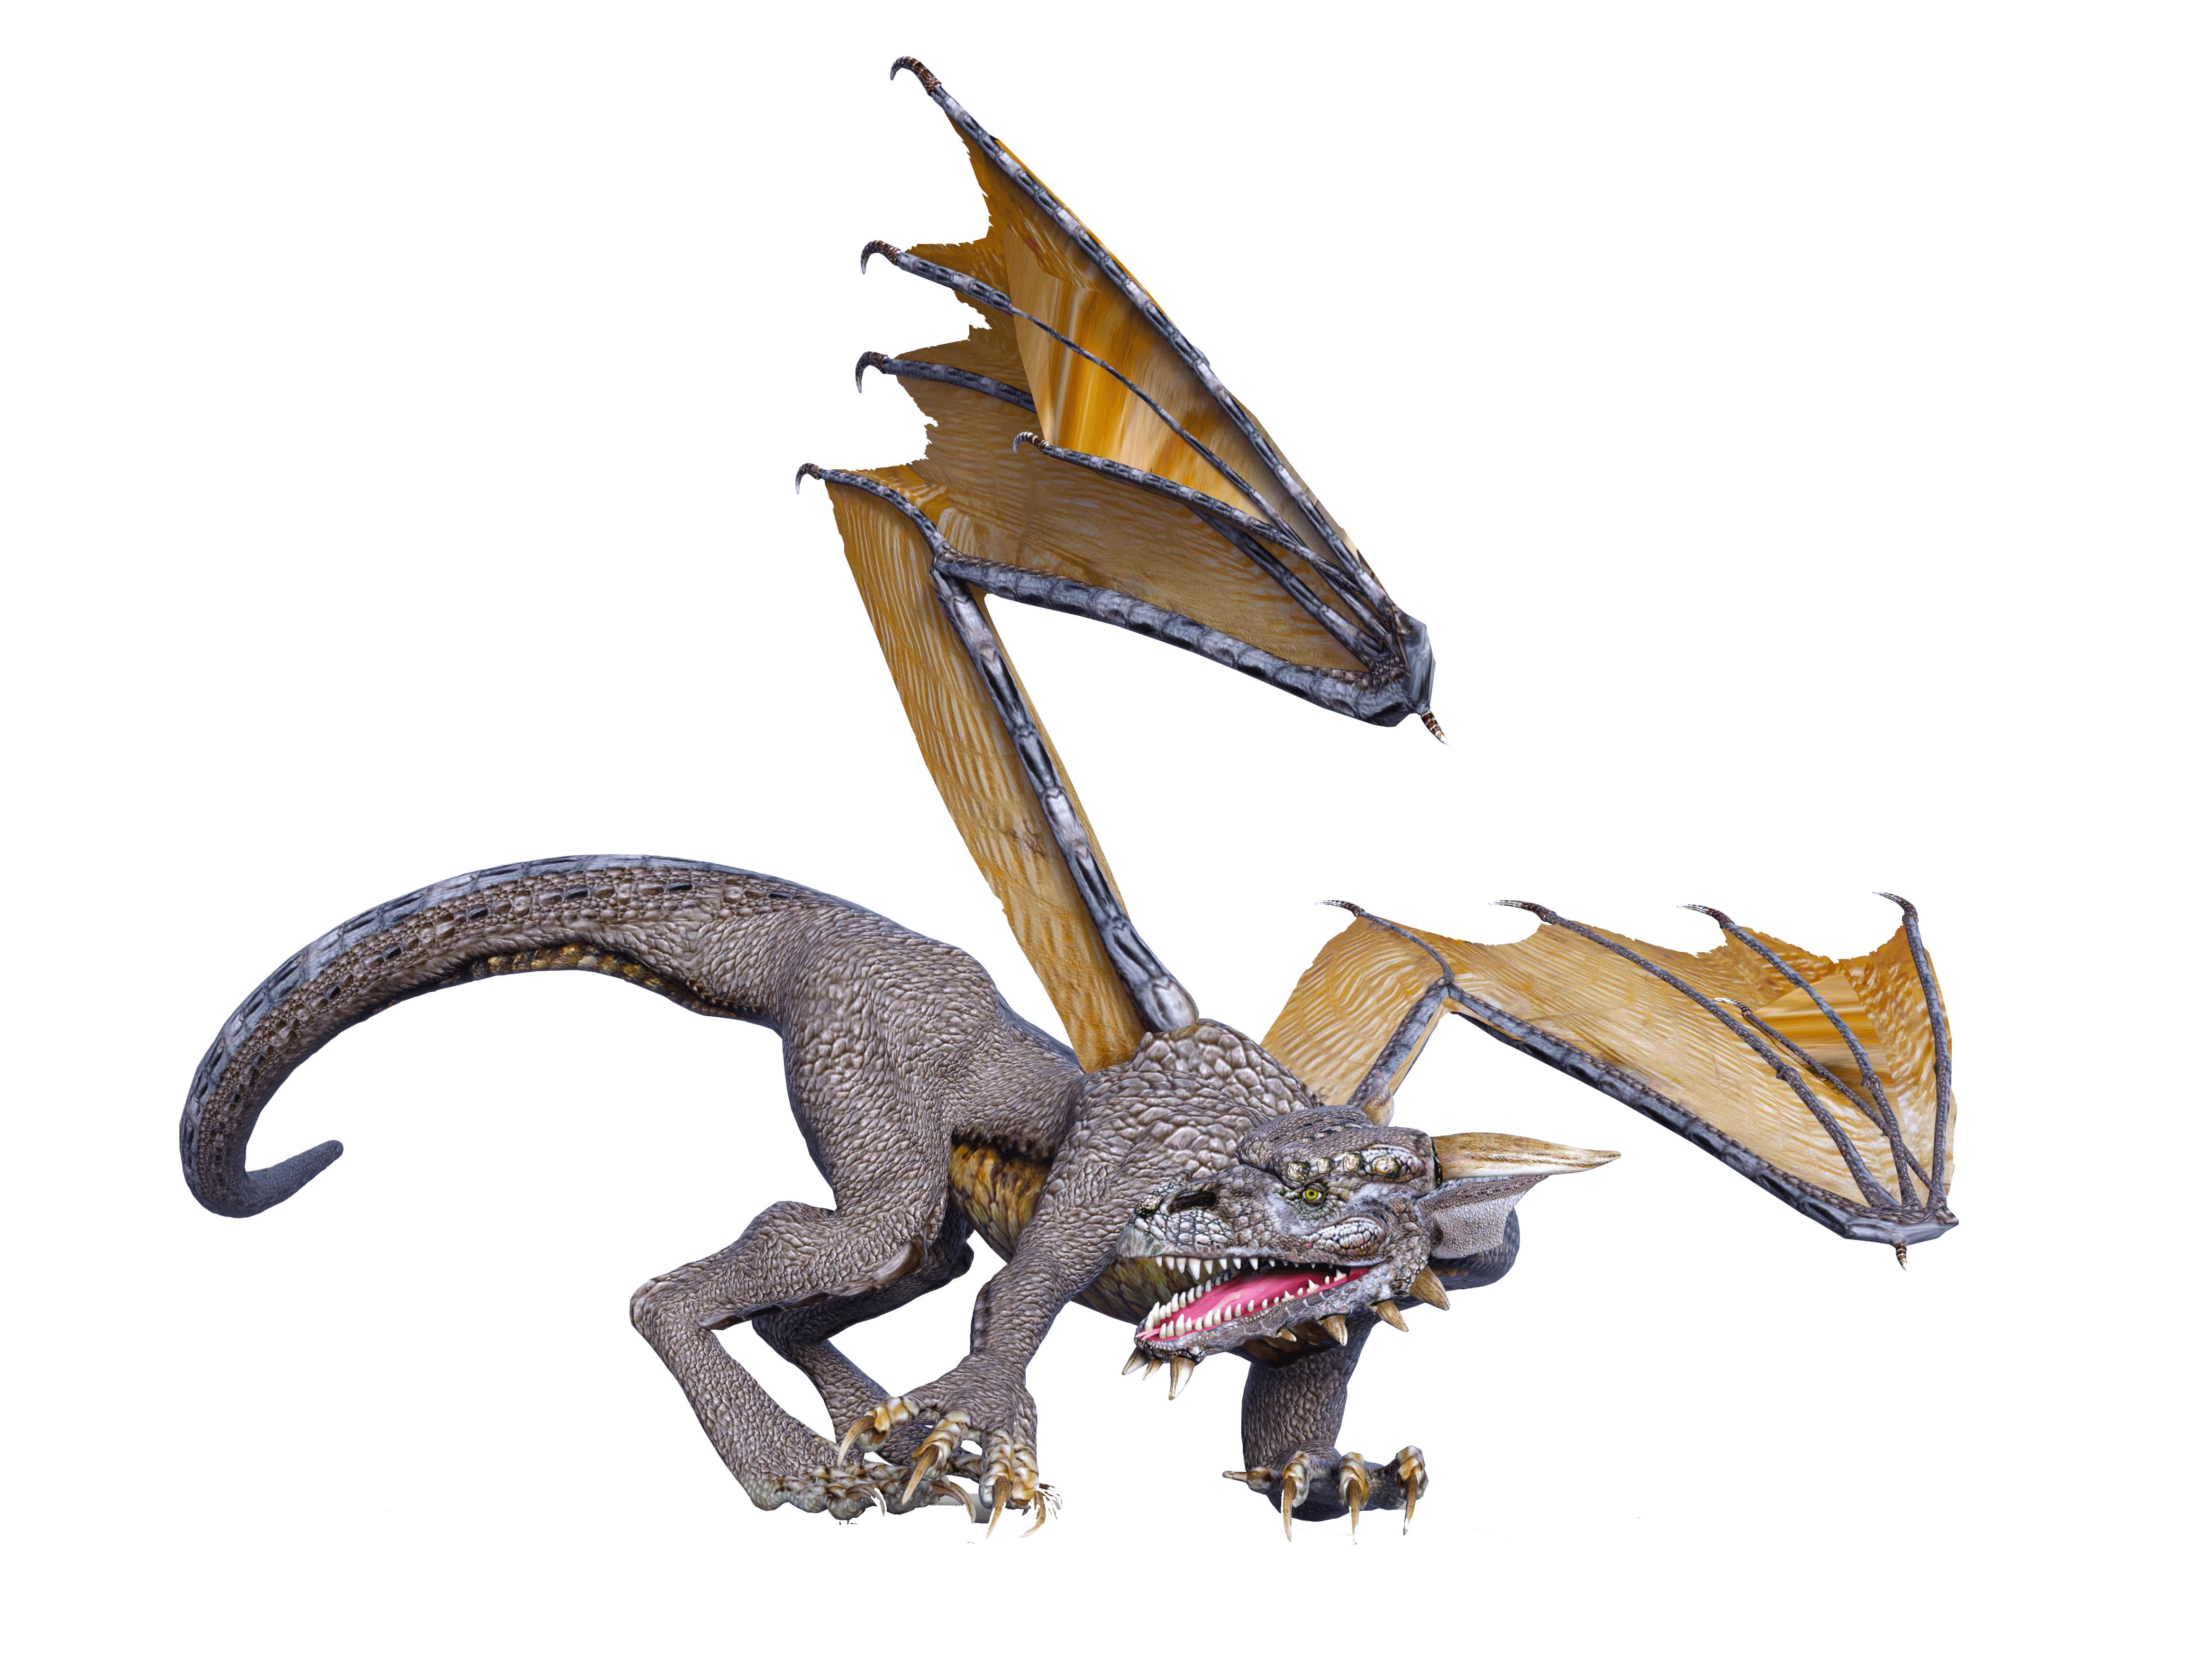 dragon crawling